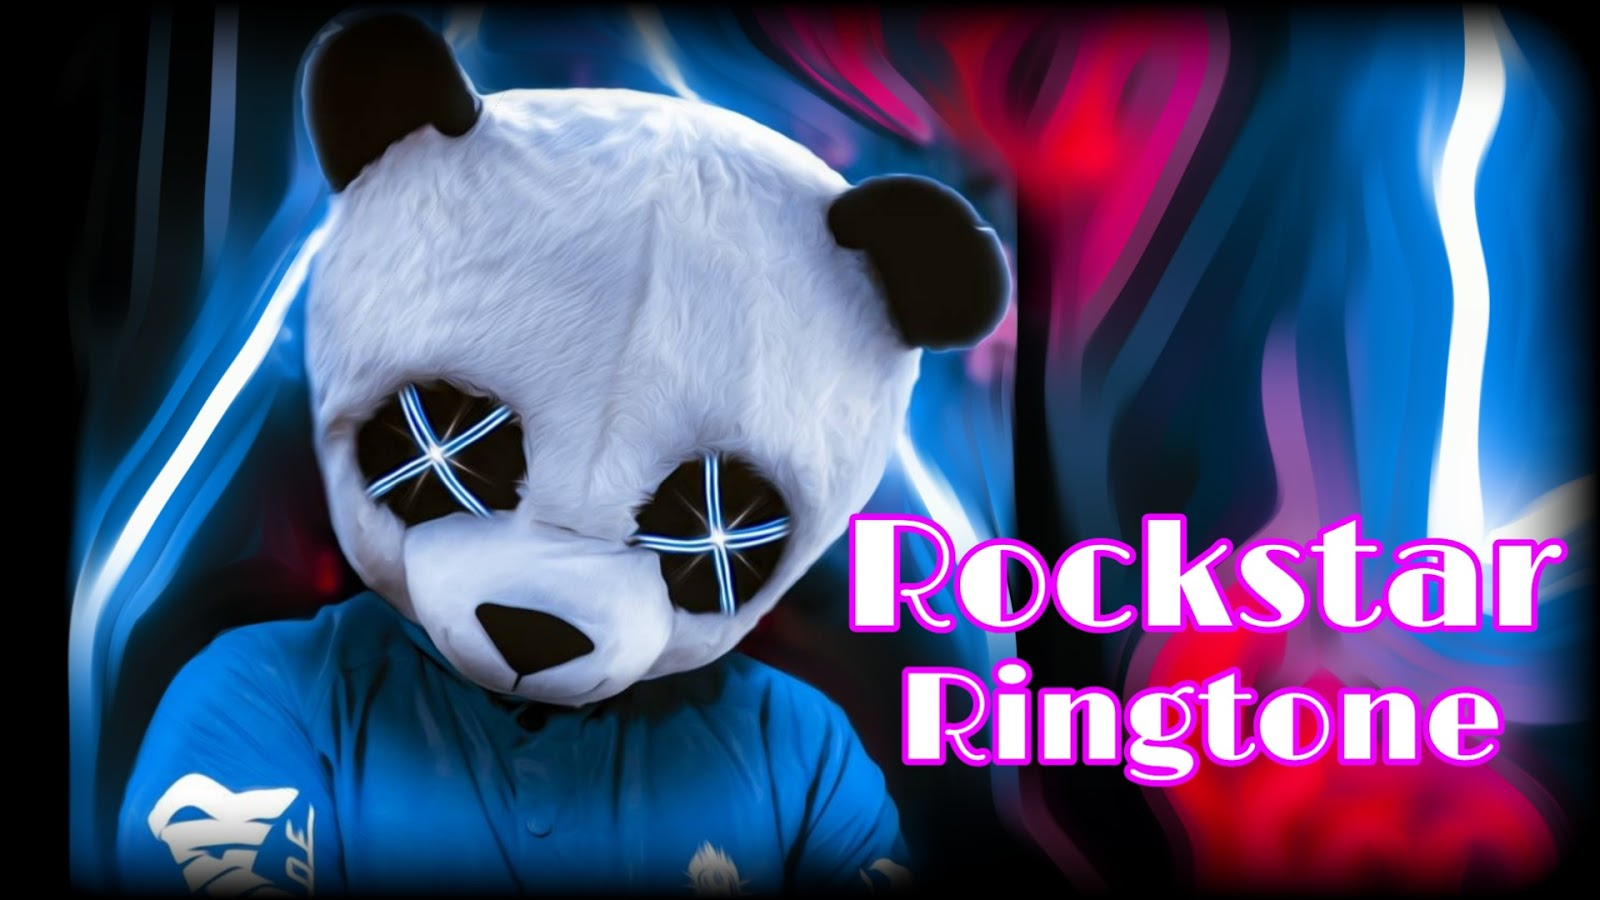 rockstar Ringtone iPhone remix ringtone - marimba Ringtone